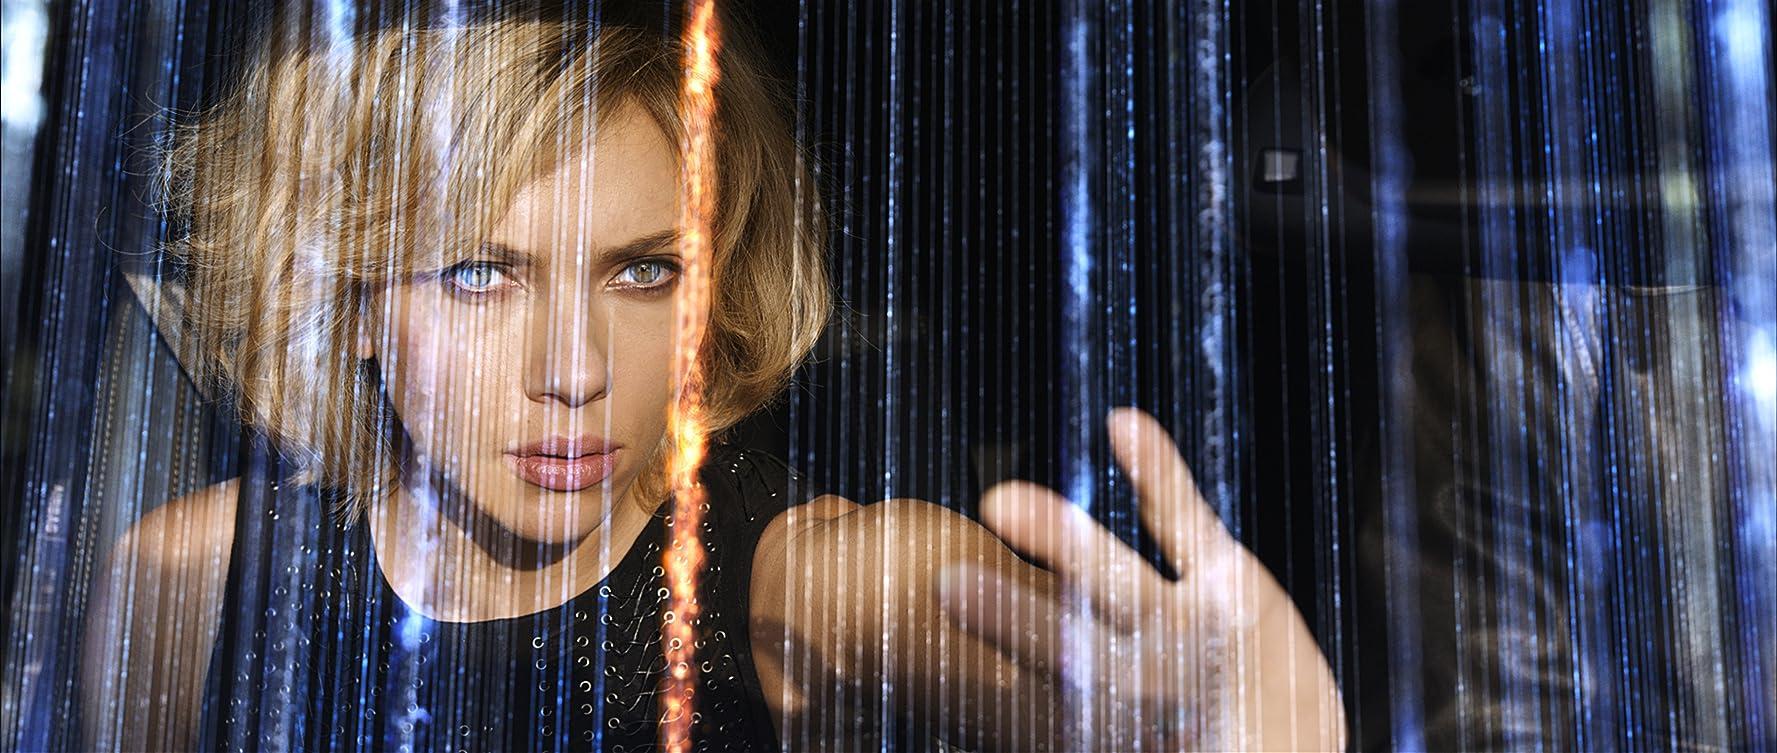 Scarlett Johansson in Lucy (2014)